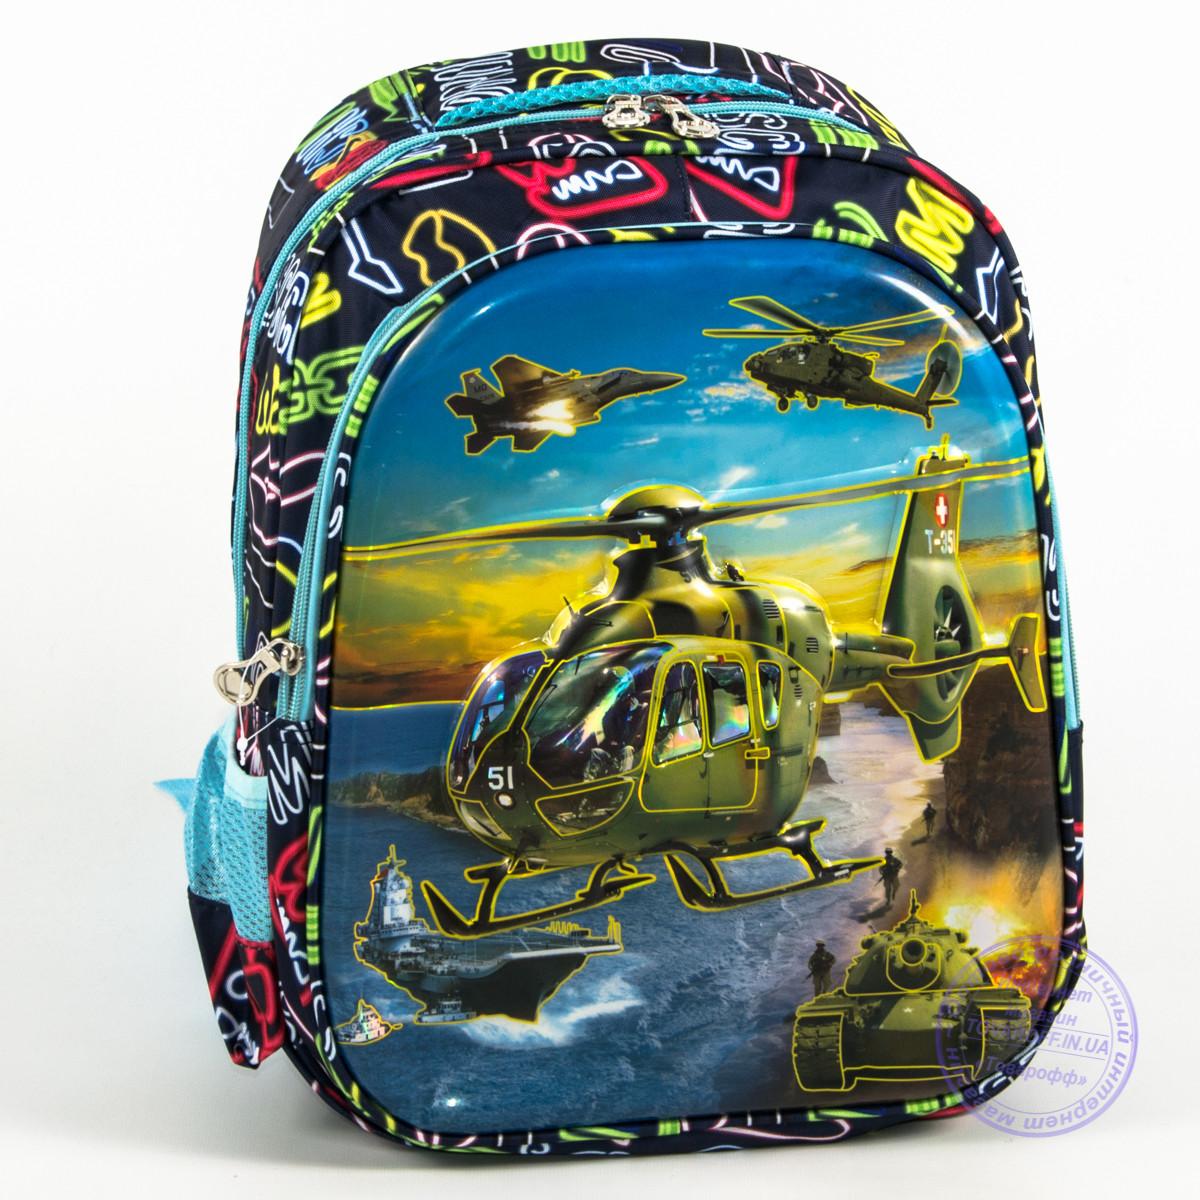 Рюкзак с вертолётом termit рюкзак мужской